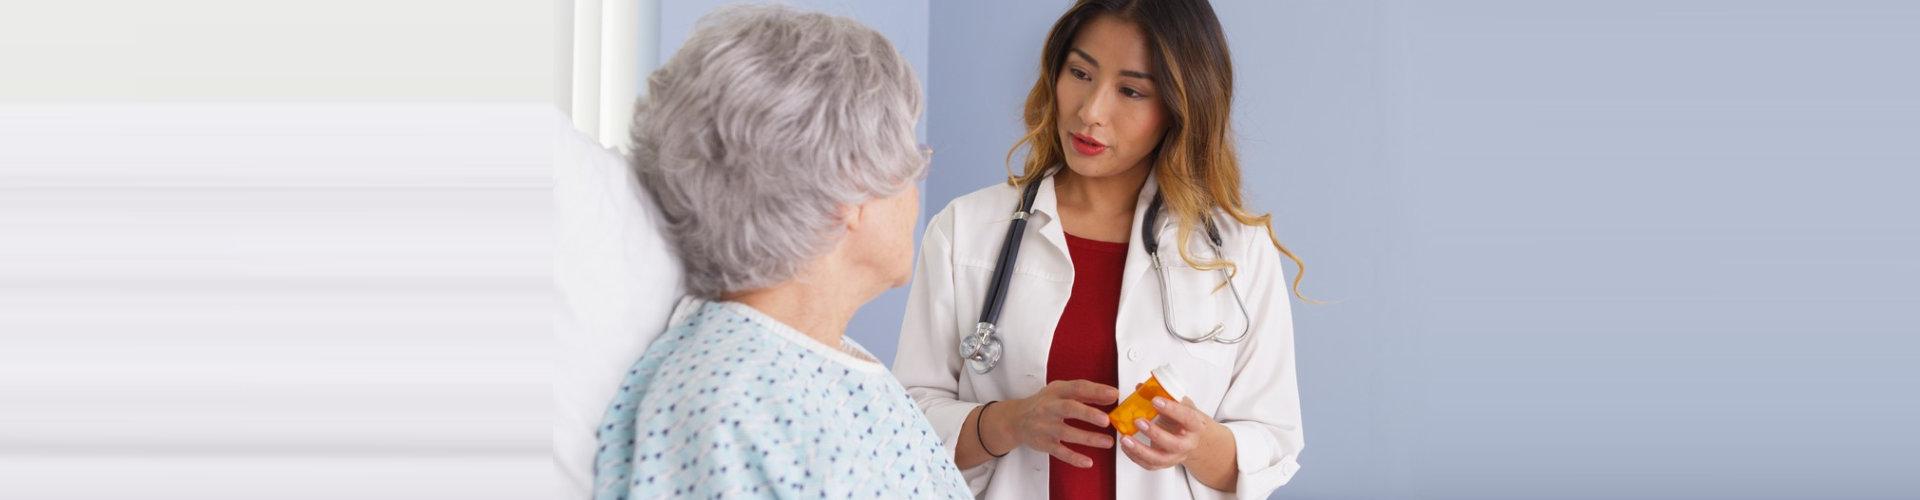 pharmacist showing elder woman medicinal options